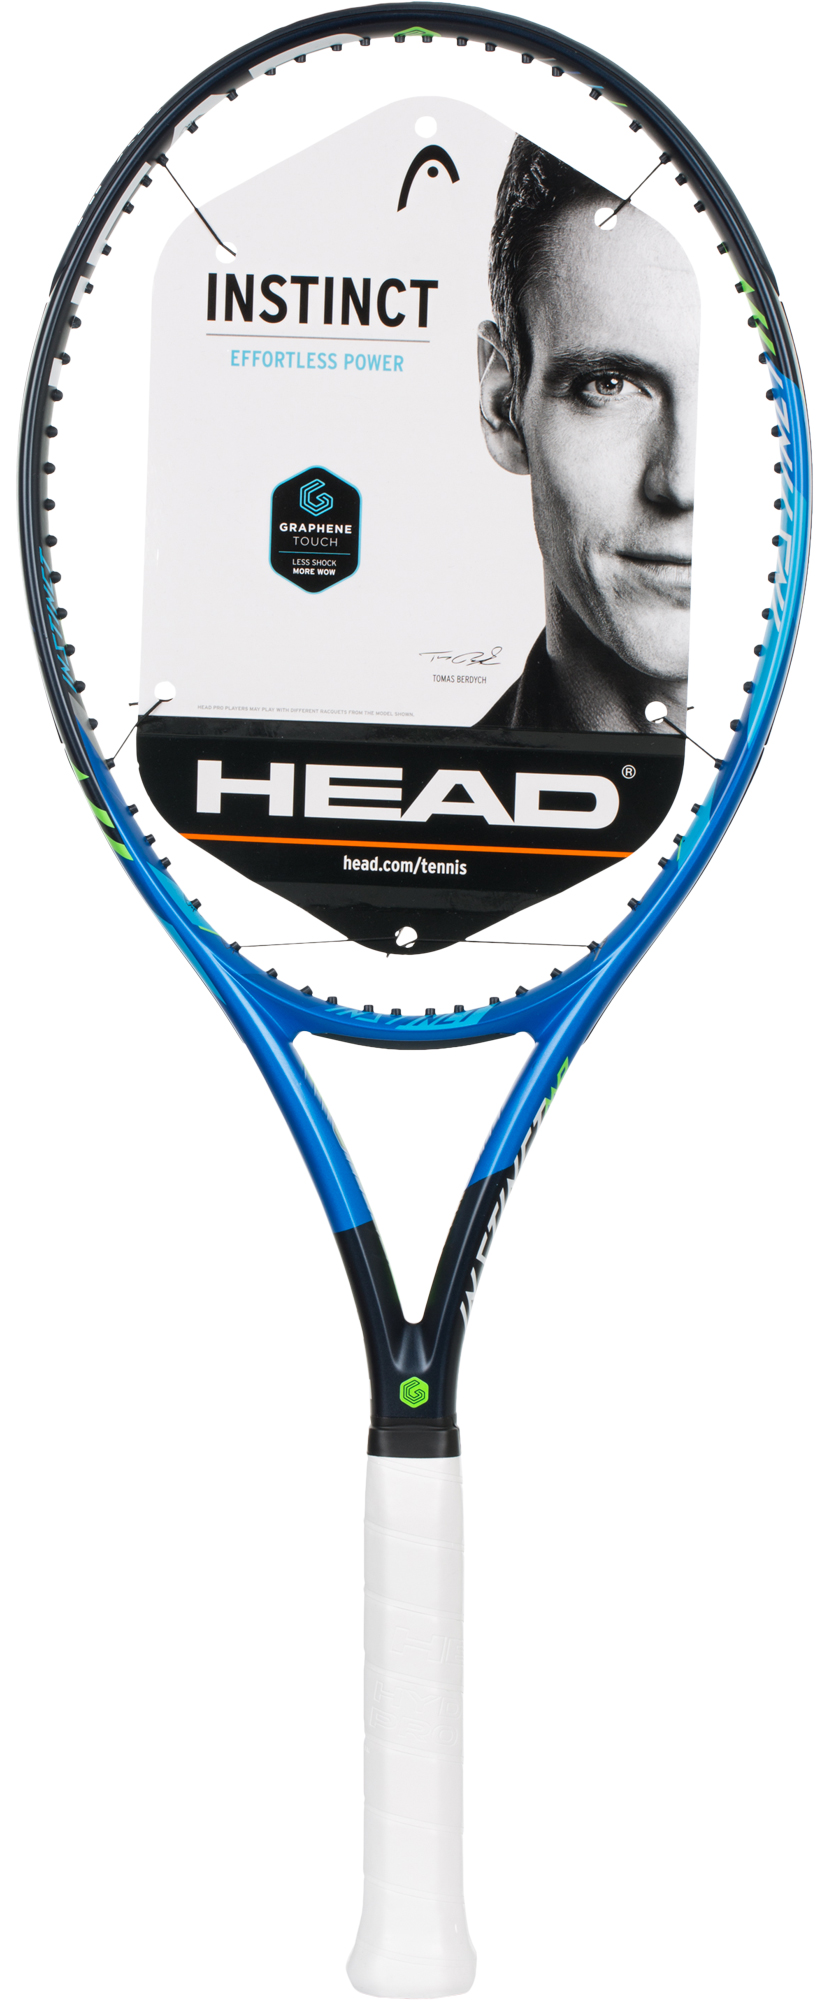 все цены на Head Ракетка для большого тенниса Head Graphene Touch Instinct MP онлайн